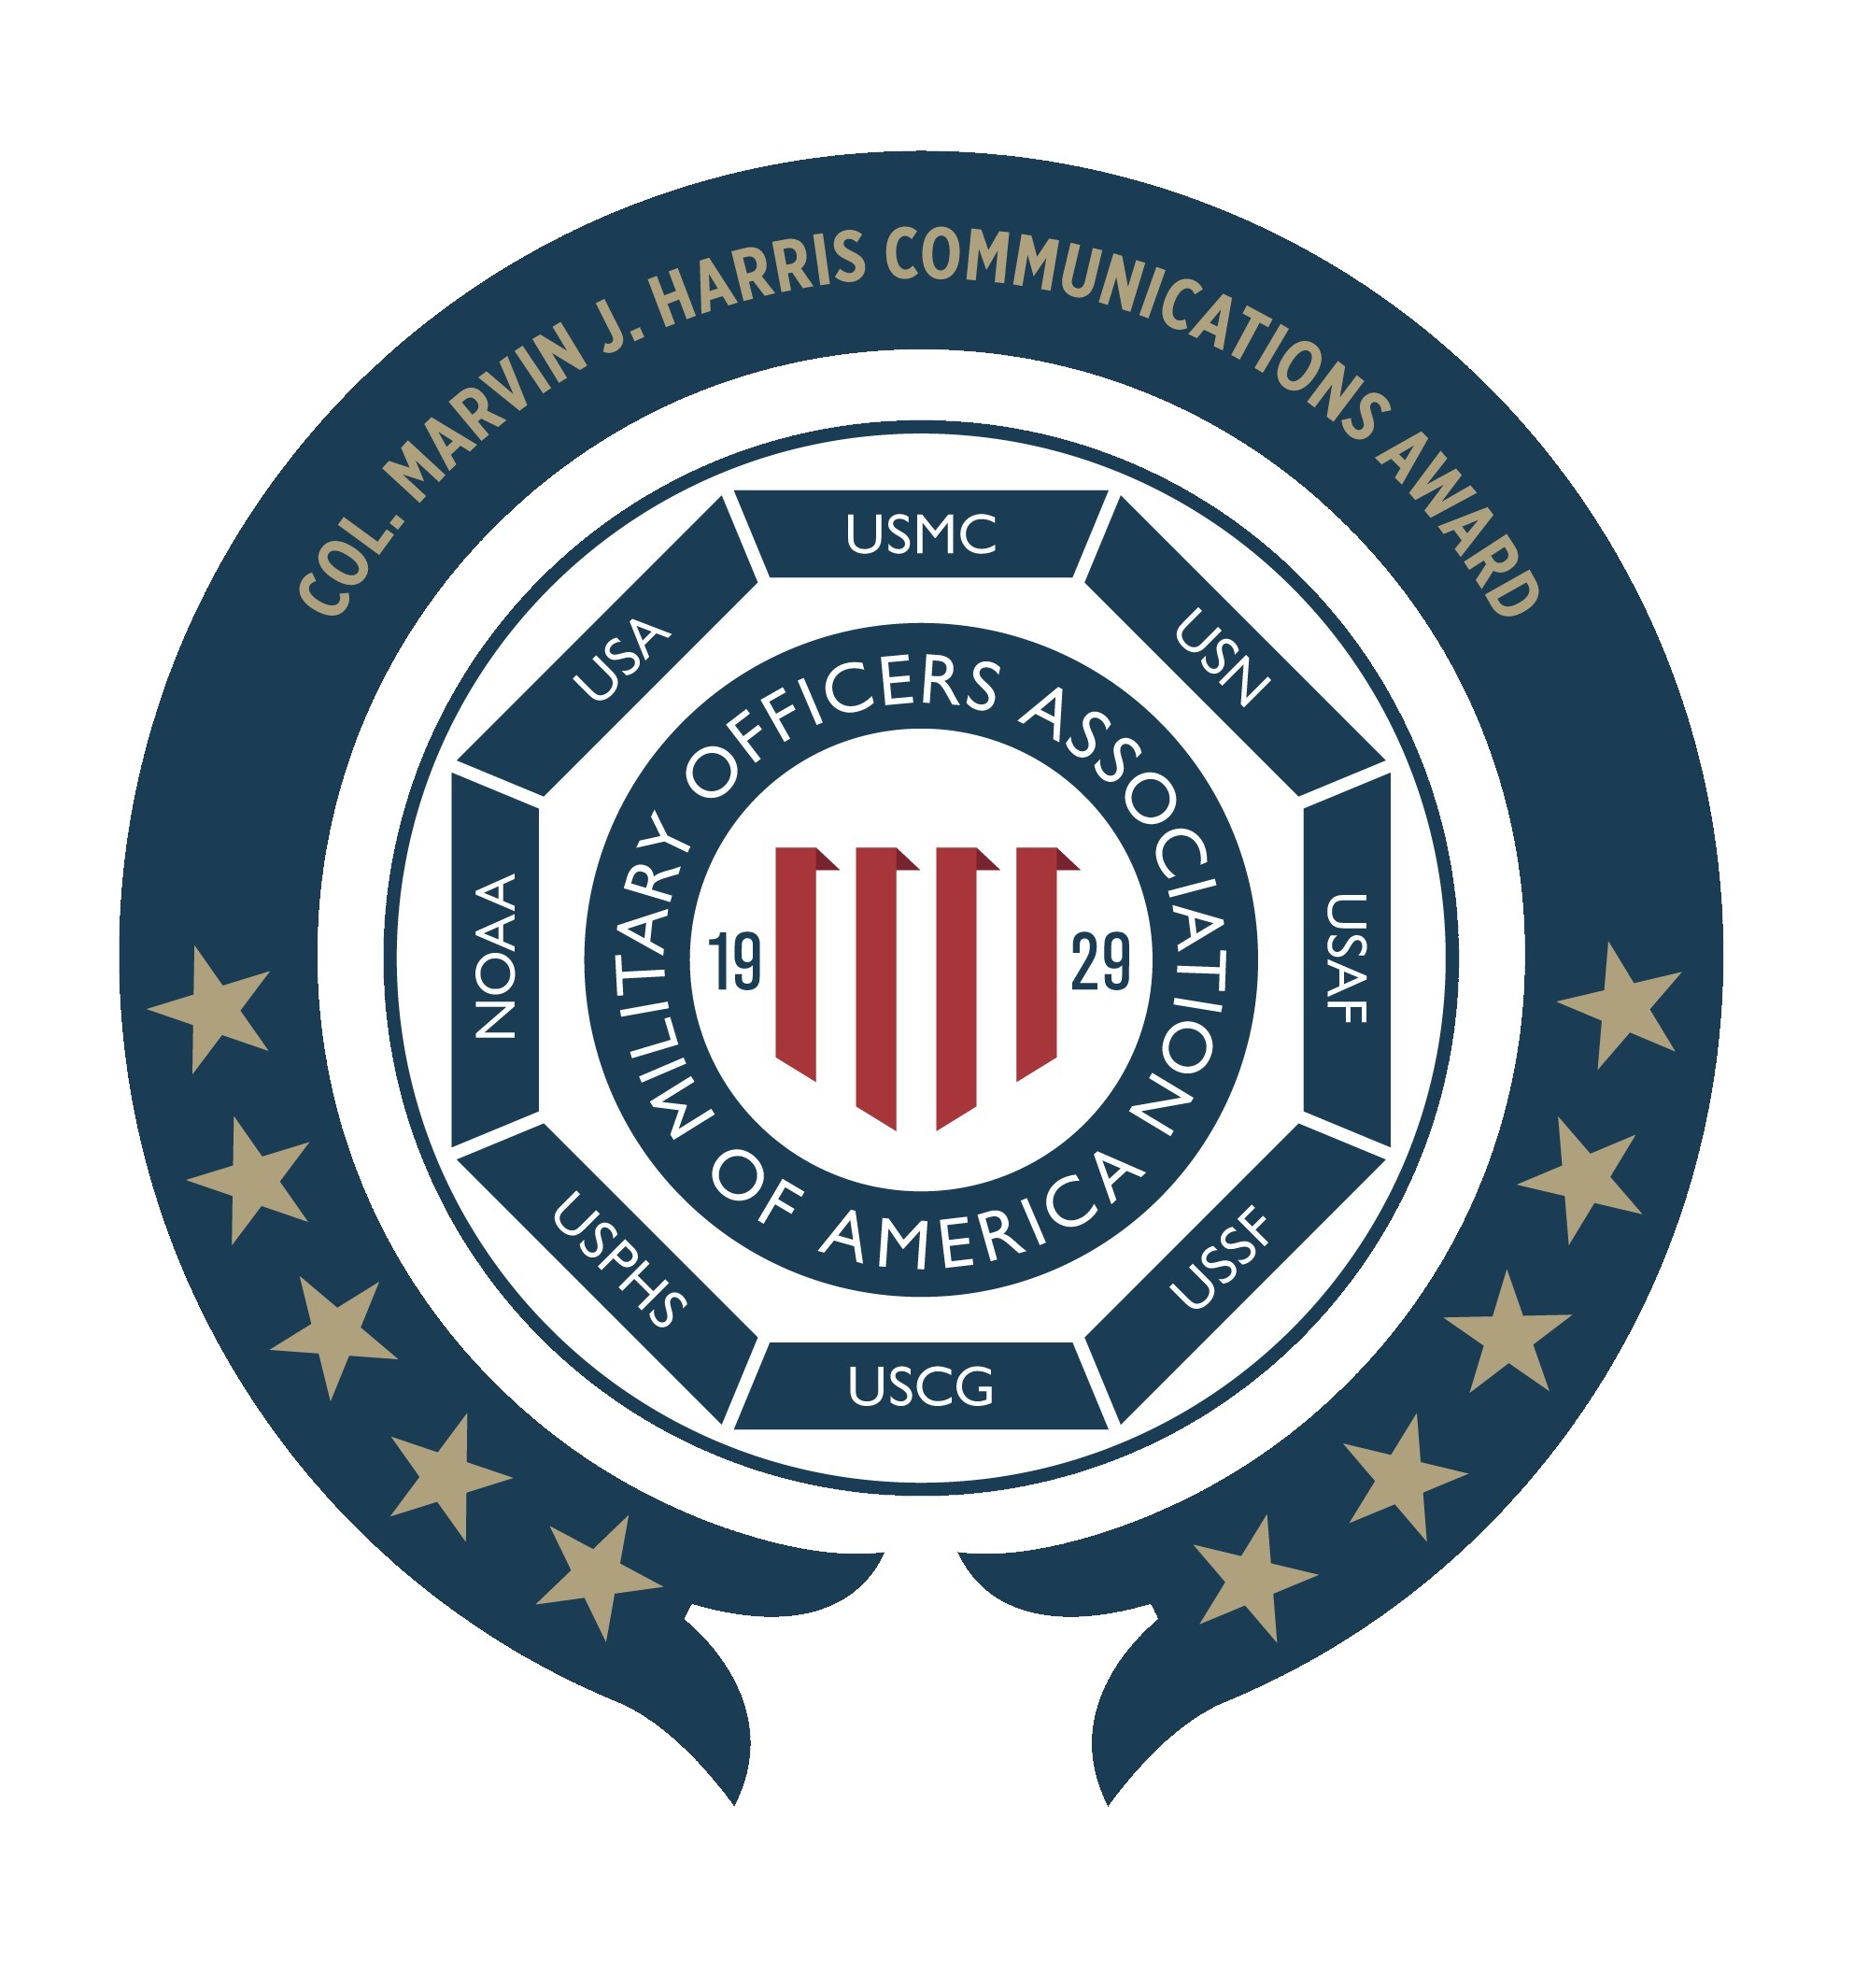 Col. Marvin J. Harris Communications Award